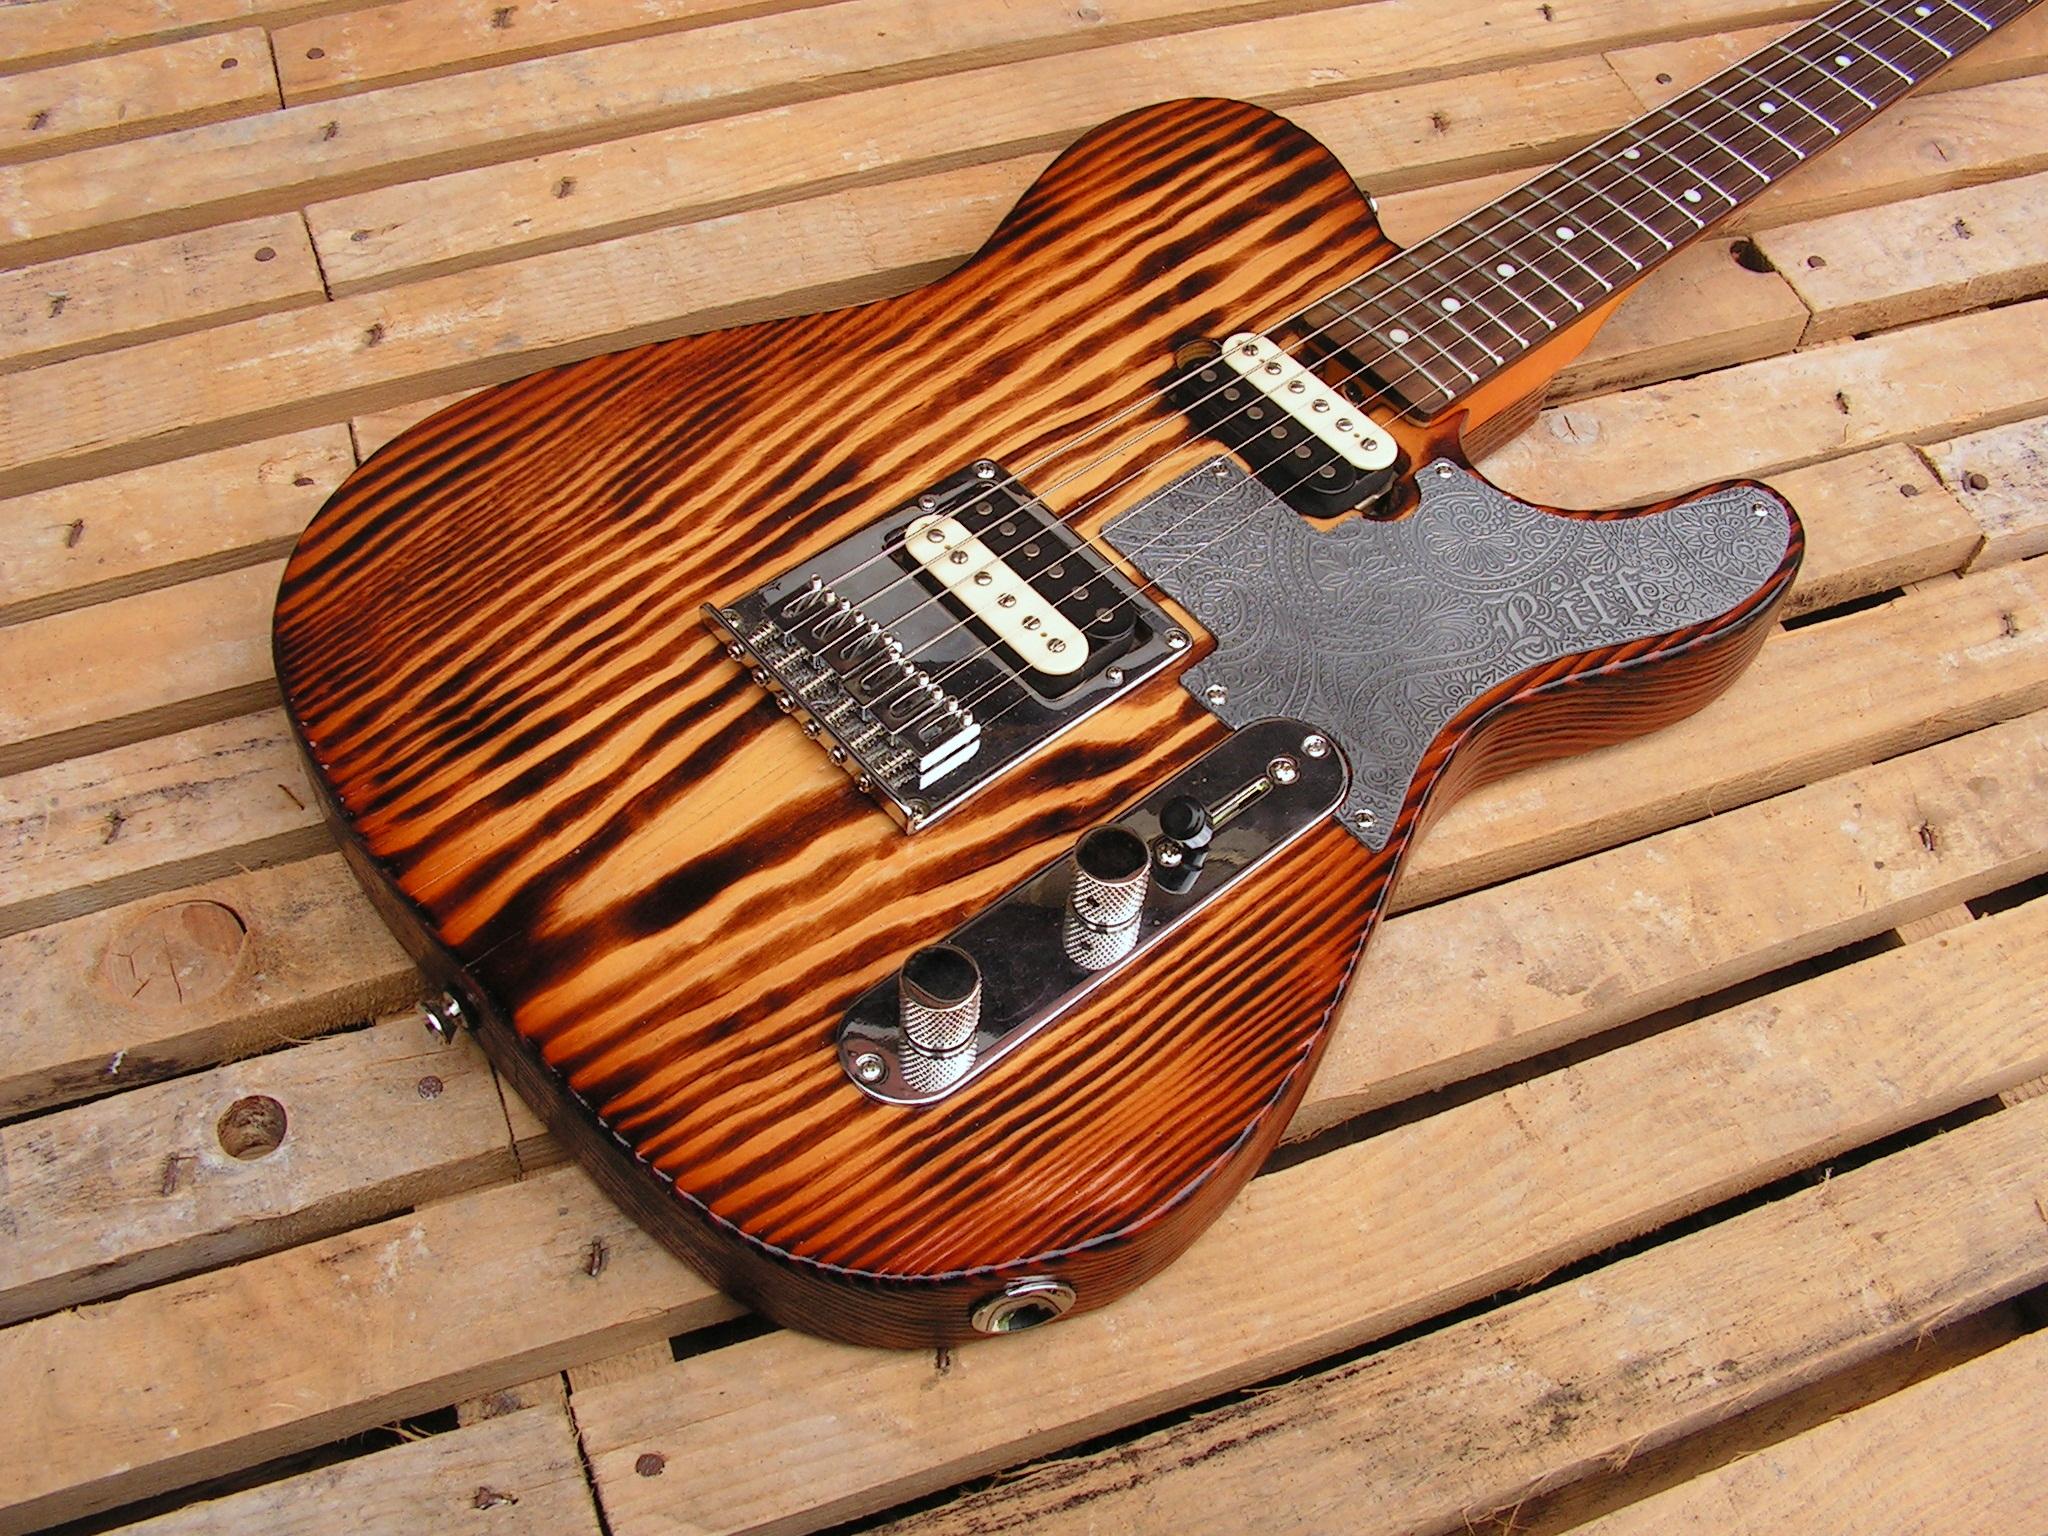 Body di una chitarra Telecaster in yellow pine roasted